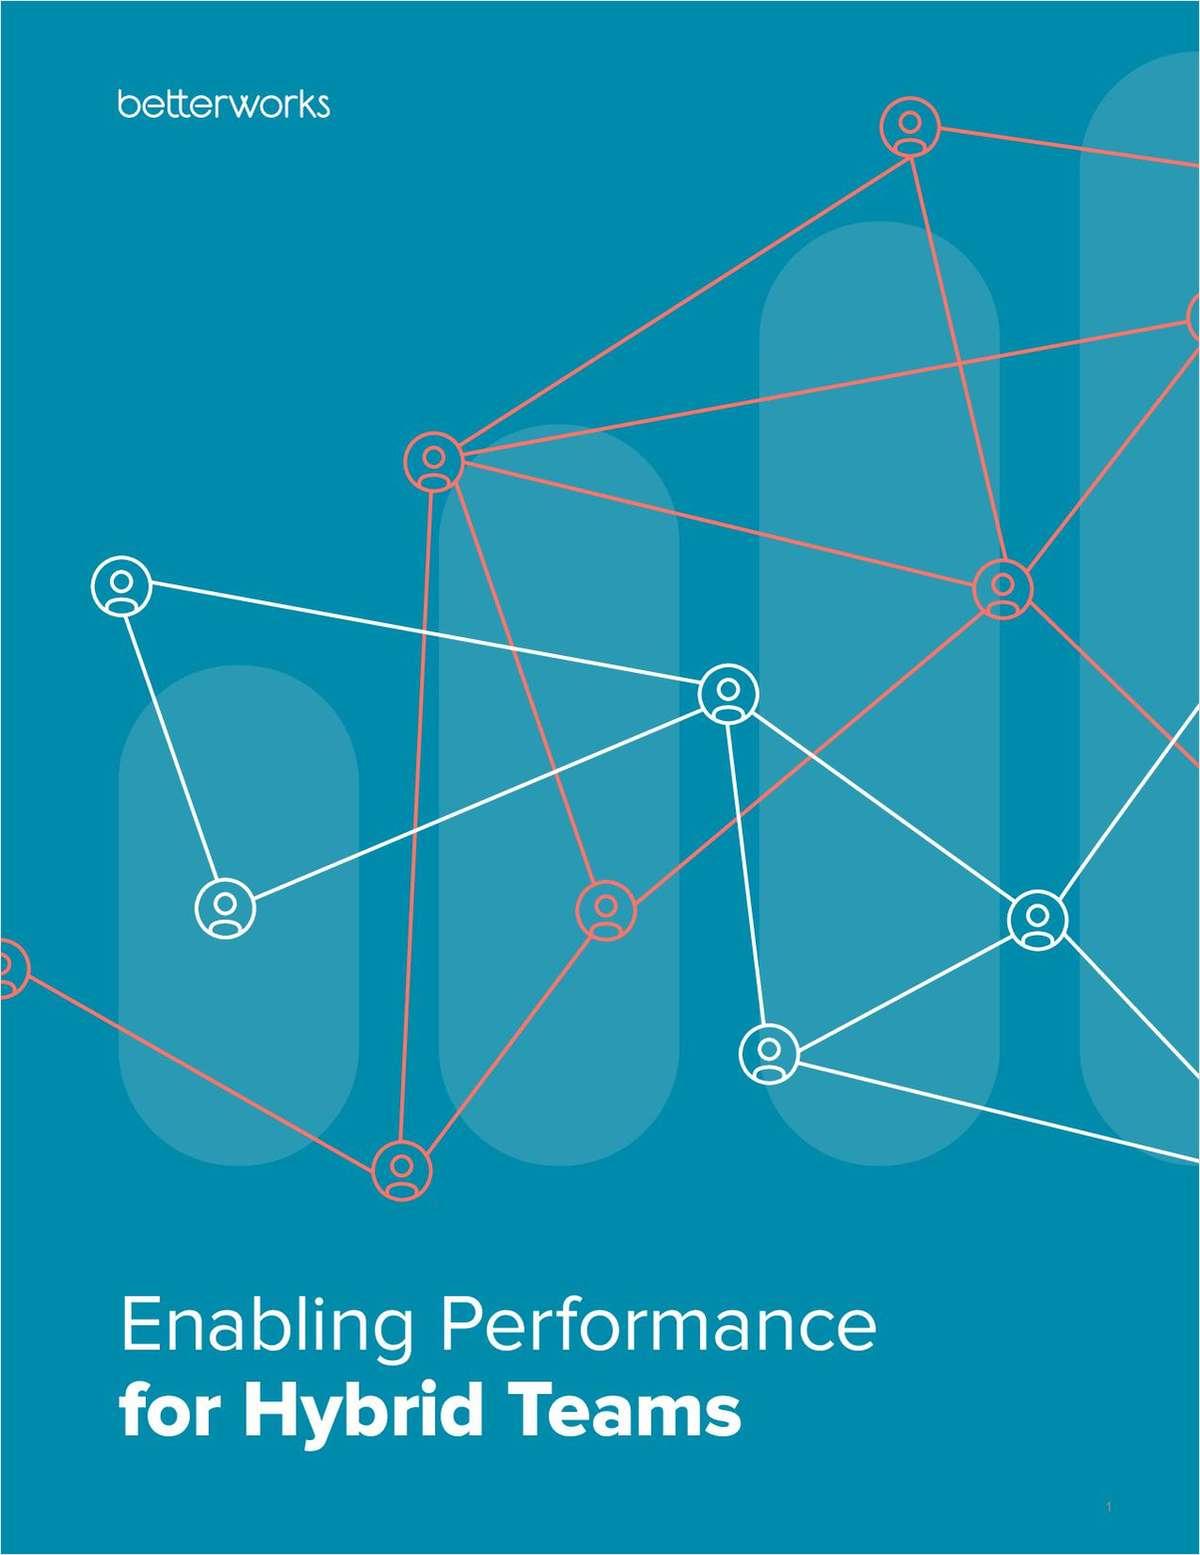 Enabling Performance for Hybrid Teams